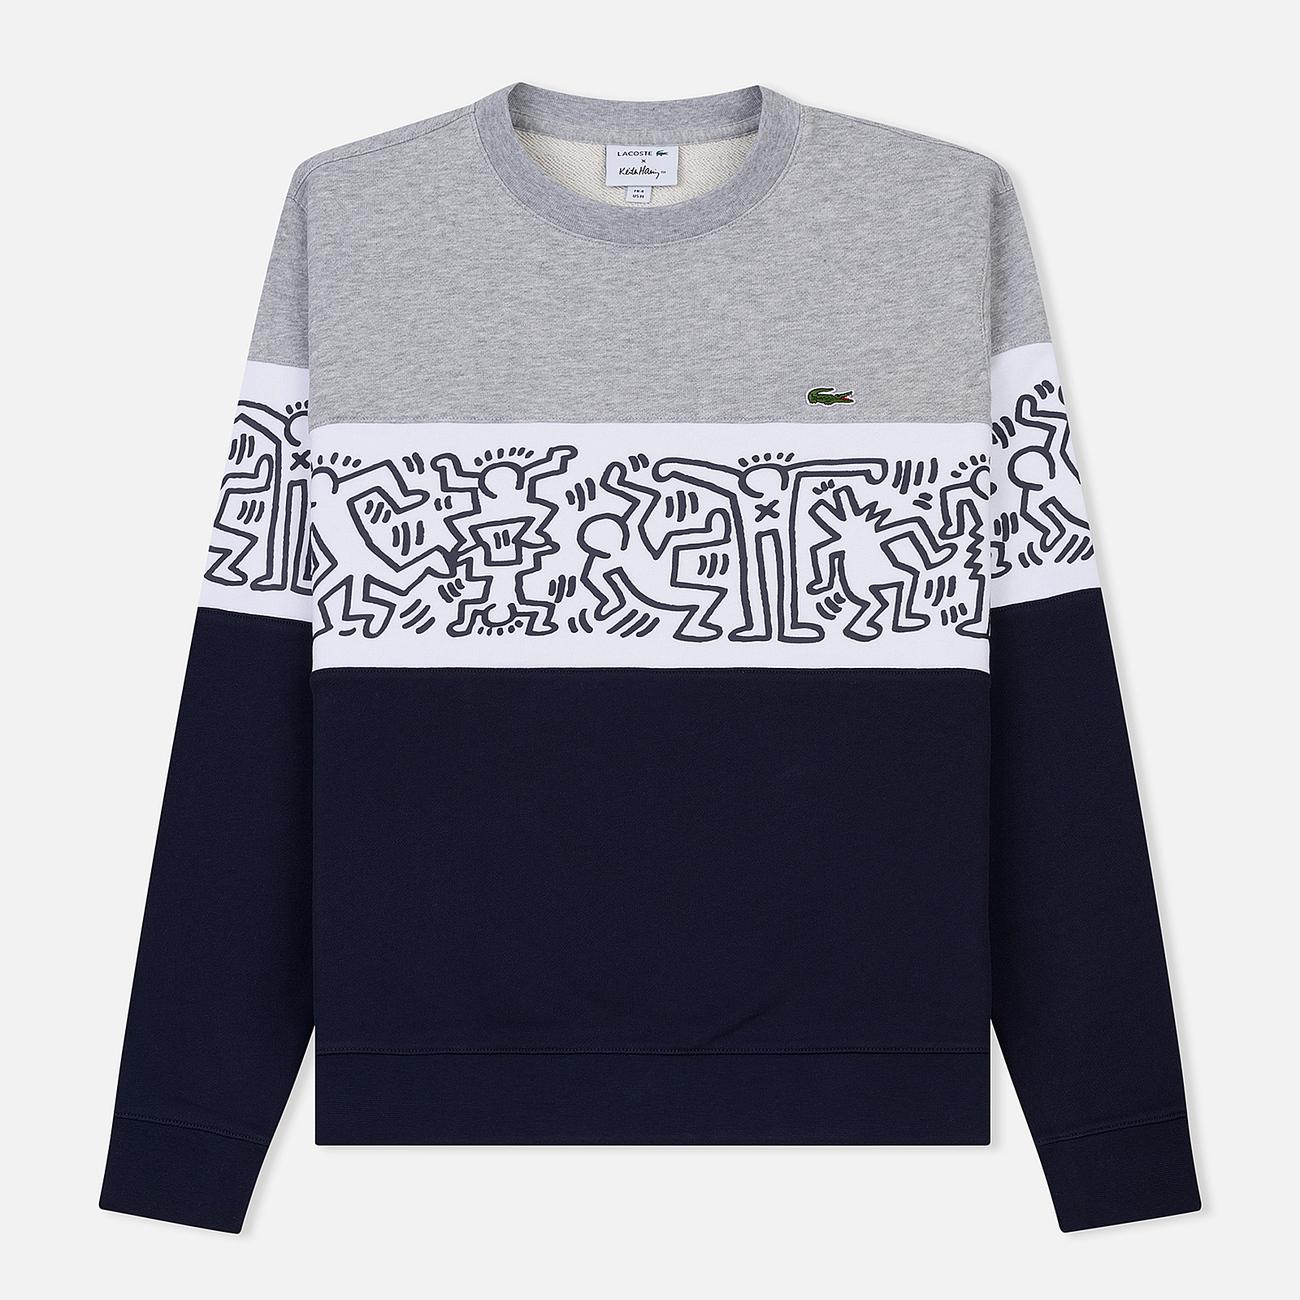 Мужская толстовка Lacoste x Keith Haring Print Crew Neck Colourblock Navy Blue/White/Grey Chine